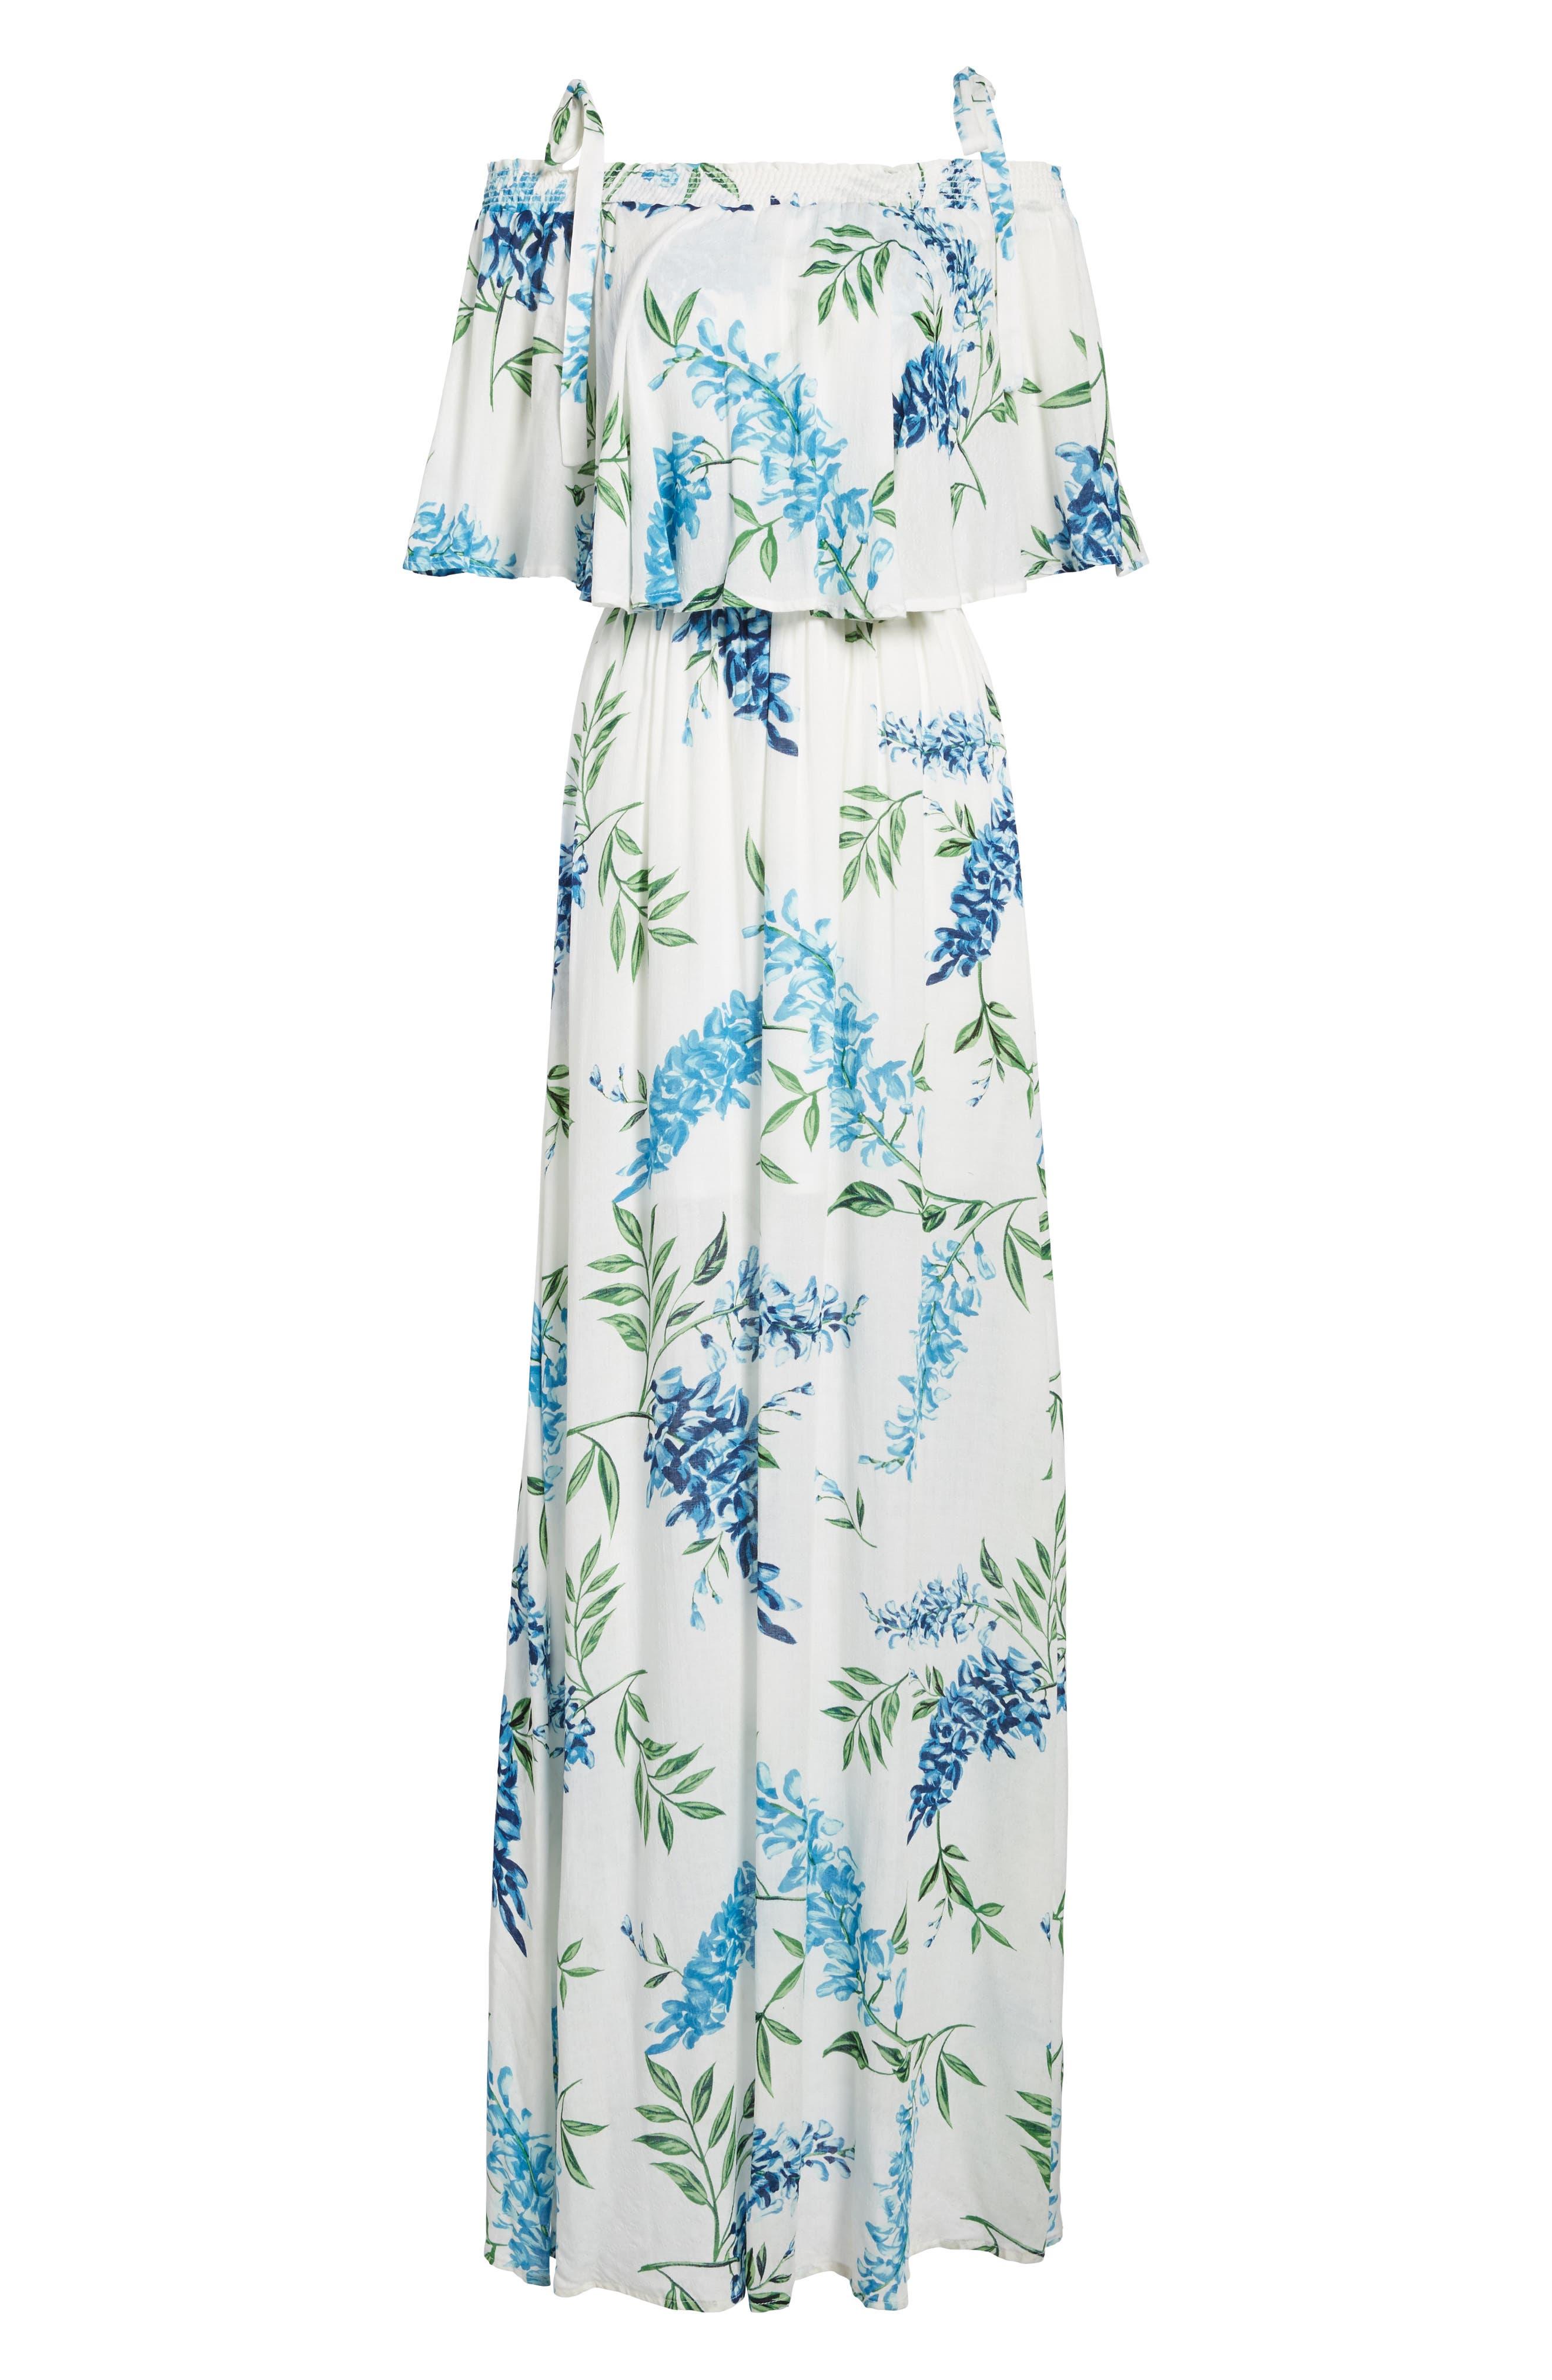 Nicola Ruffle Maxi Dress,                             Alternate thumbnail 6, color,                             400